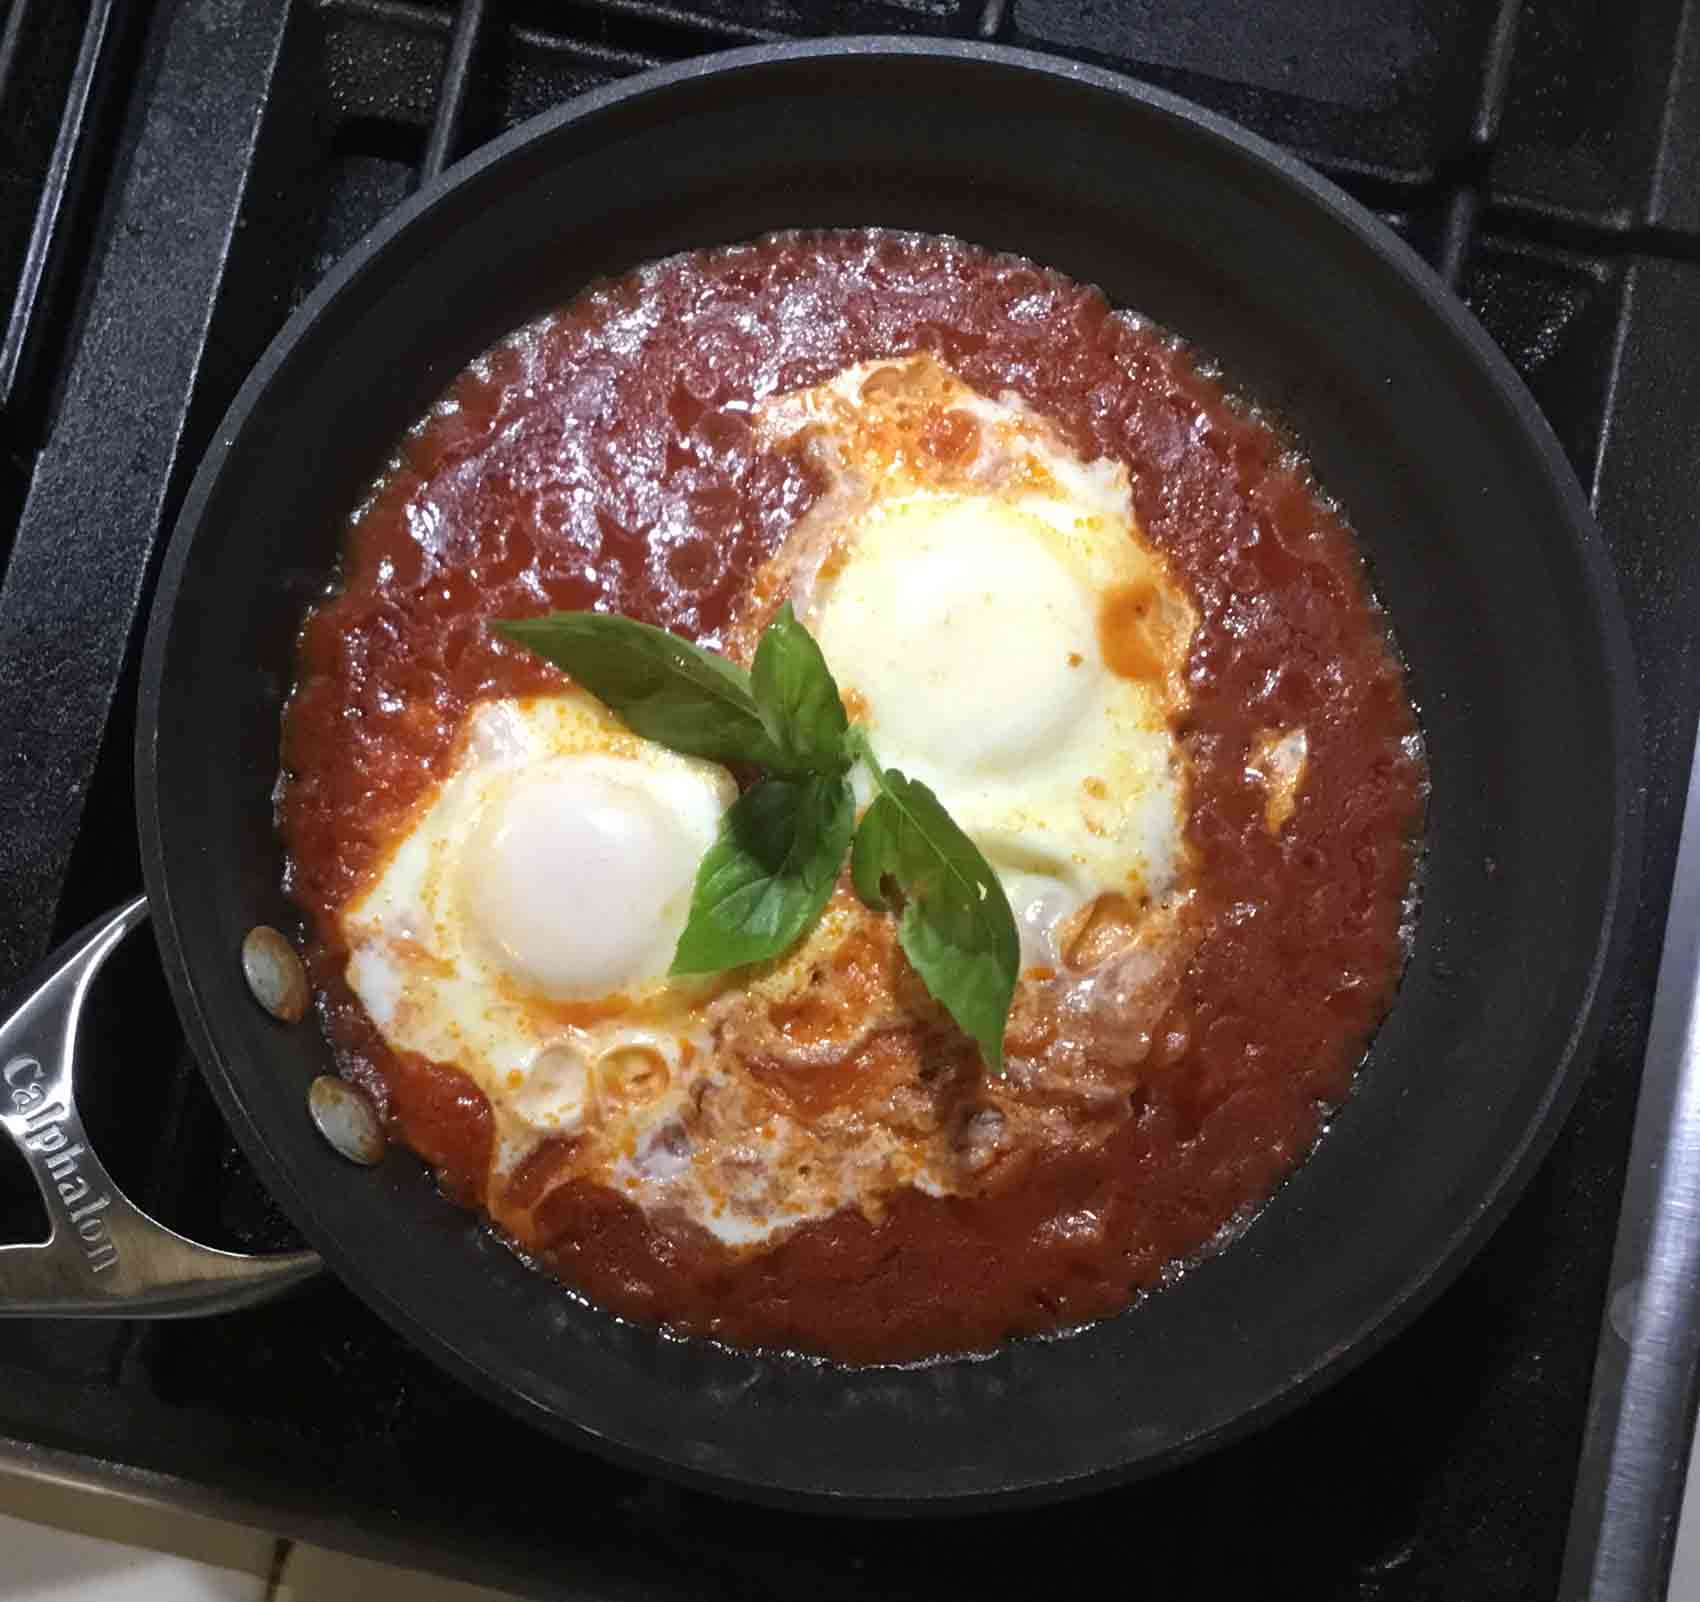 GrannyKeto.com Recipes: Shaksuka (Poached Eggs in Sauce)